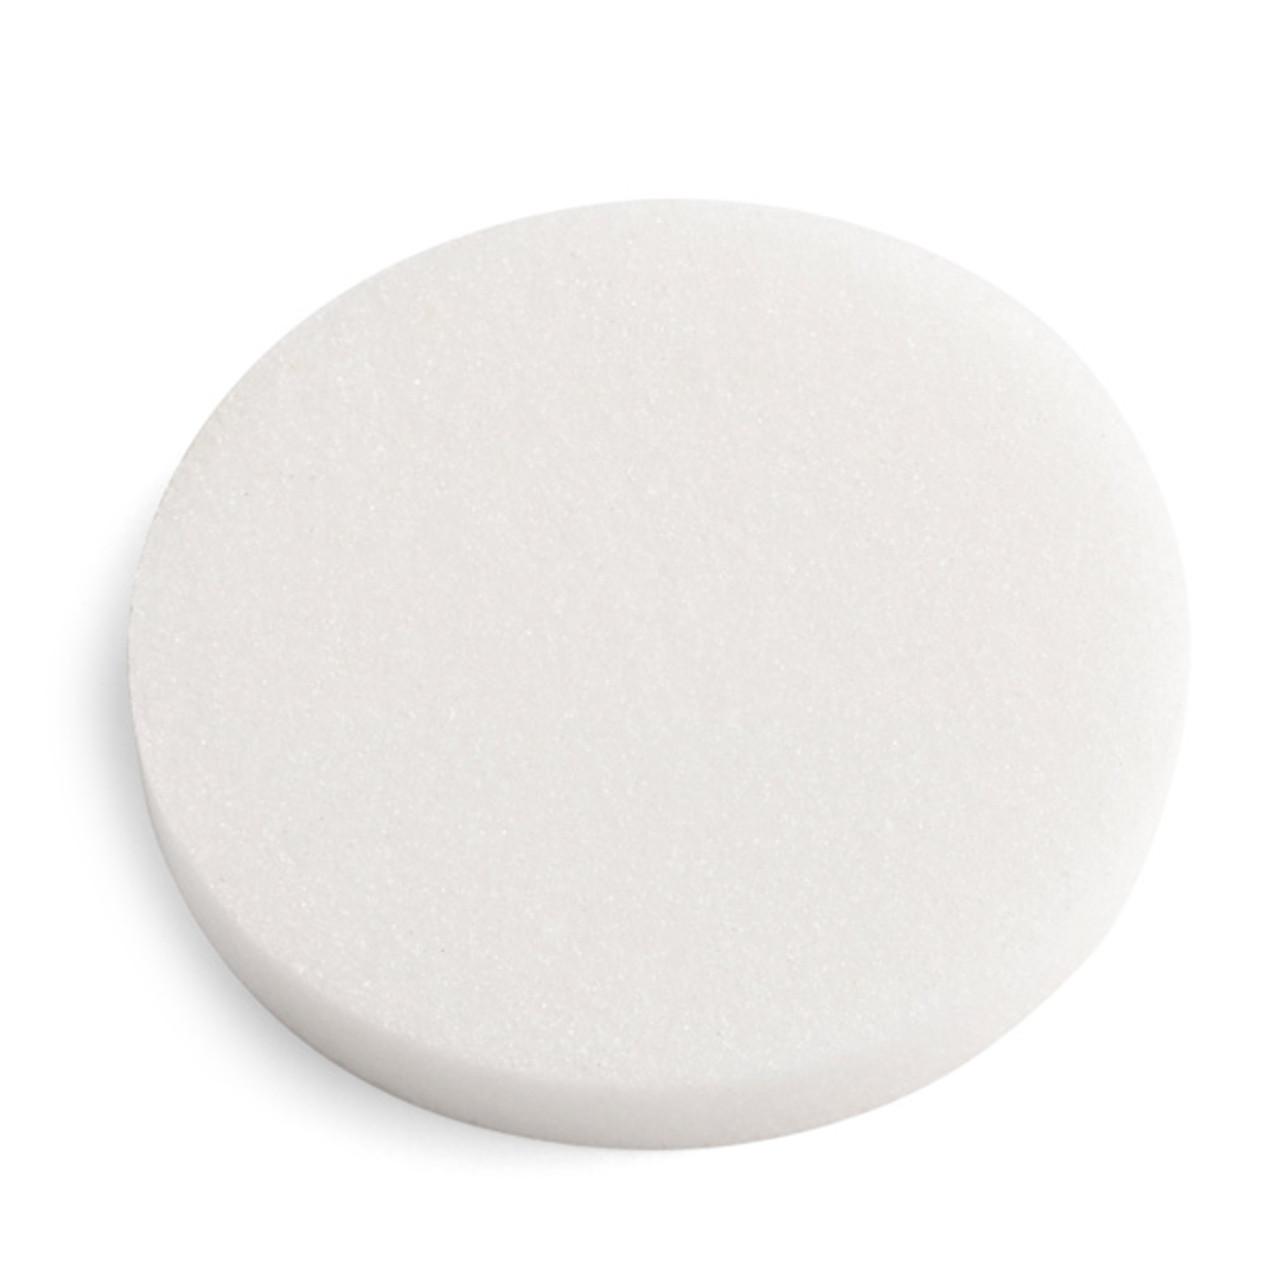 Yama Ceramic Cold Brew Filter